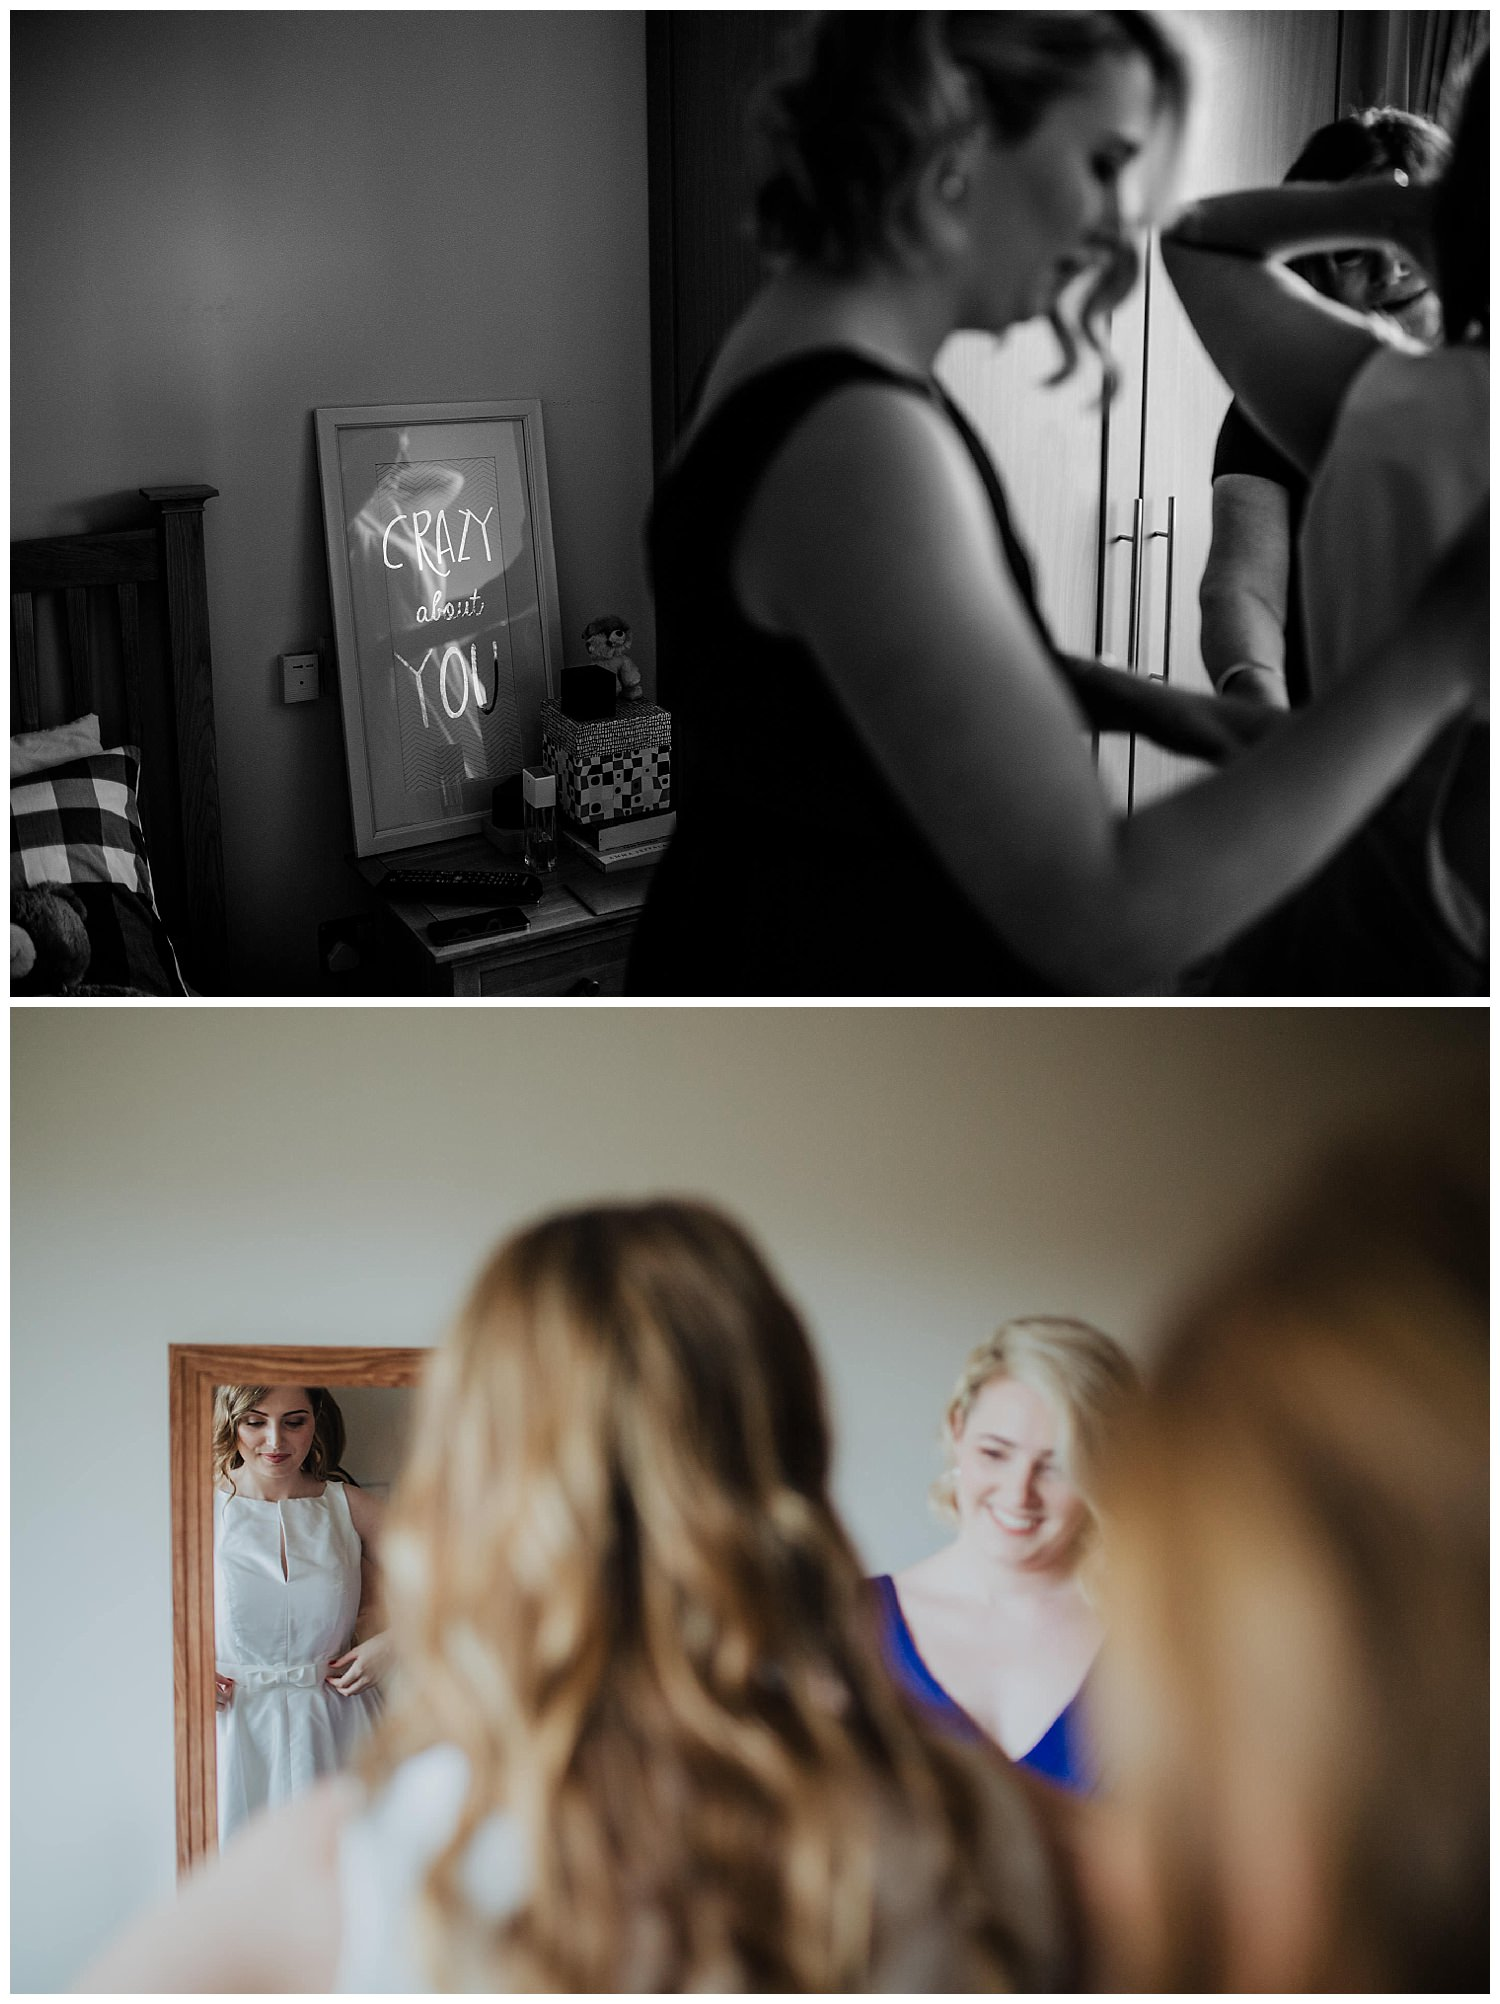 medley_dublin_city_wedding_photographer_2017_06.jpg